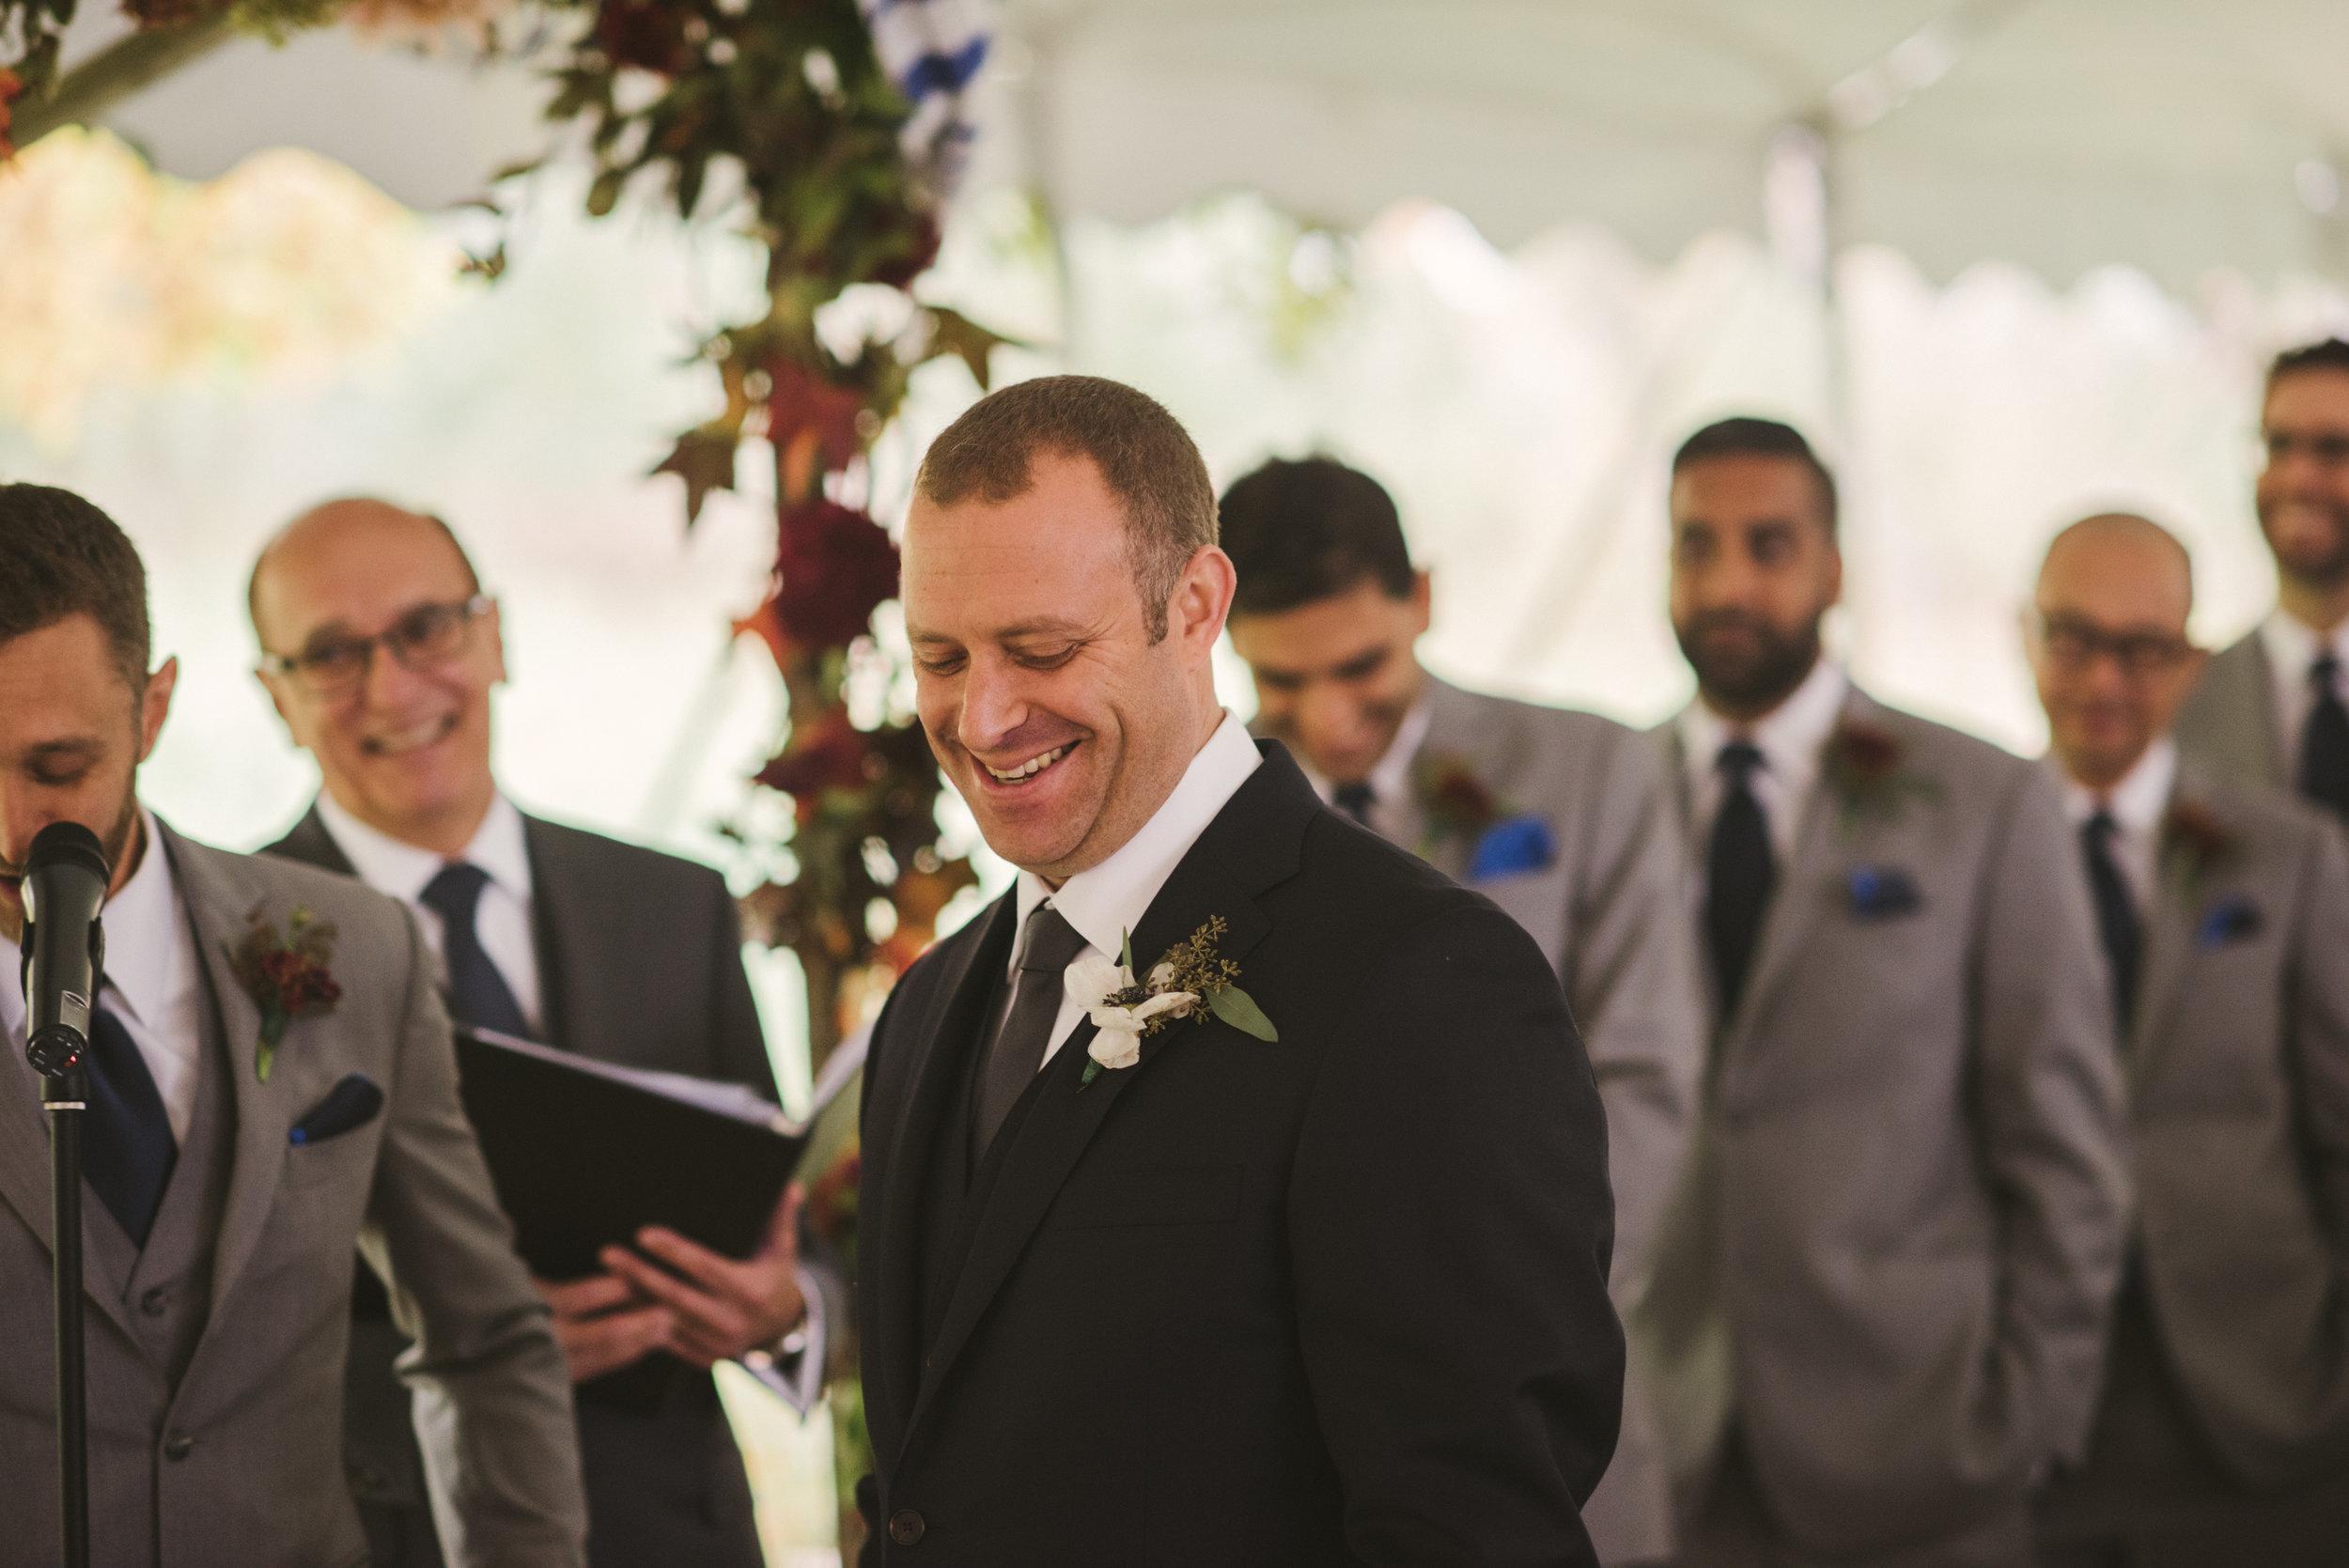 JACQUELINE & ANDREW WARSHAWER -BROOKMILL FARM FALL WEDDING - INTIMATE WEDDING PHOTOGRAPHER - TWOTWENTY by CHI-CHI AGBIM-239.jpg